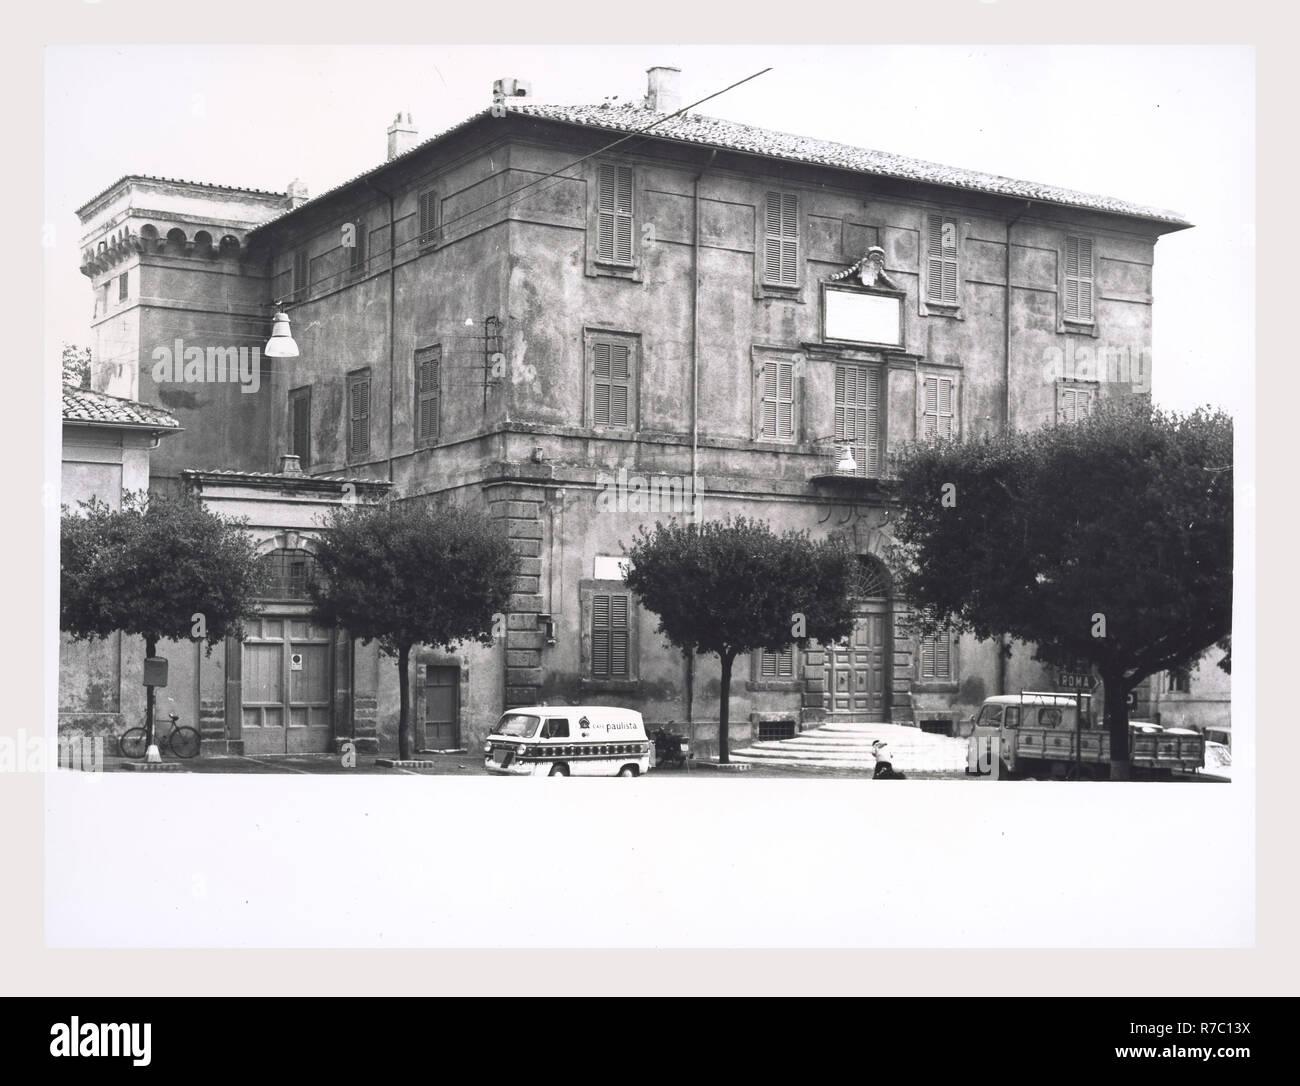 197 Piermarini Design Roma tittoni stock photos & tittoni stock images - alamy